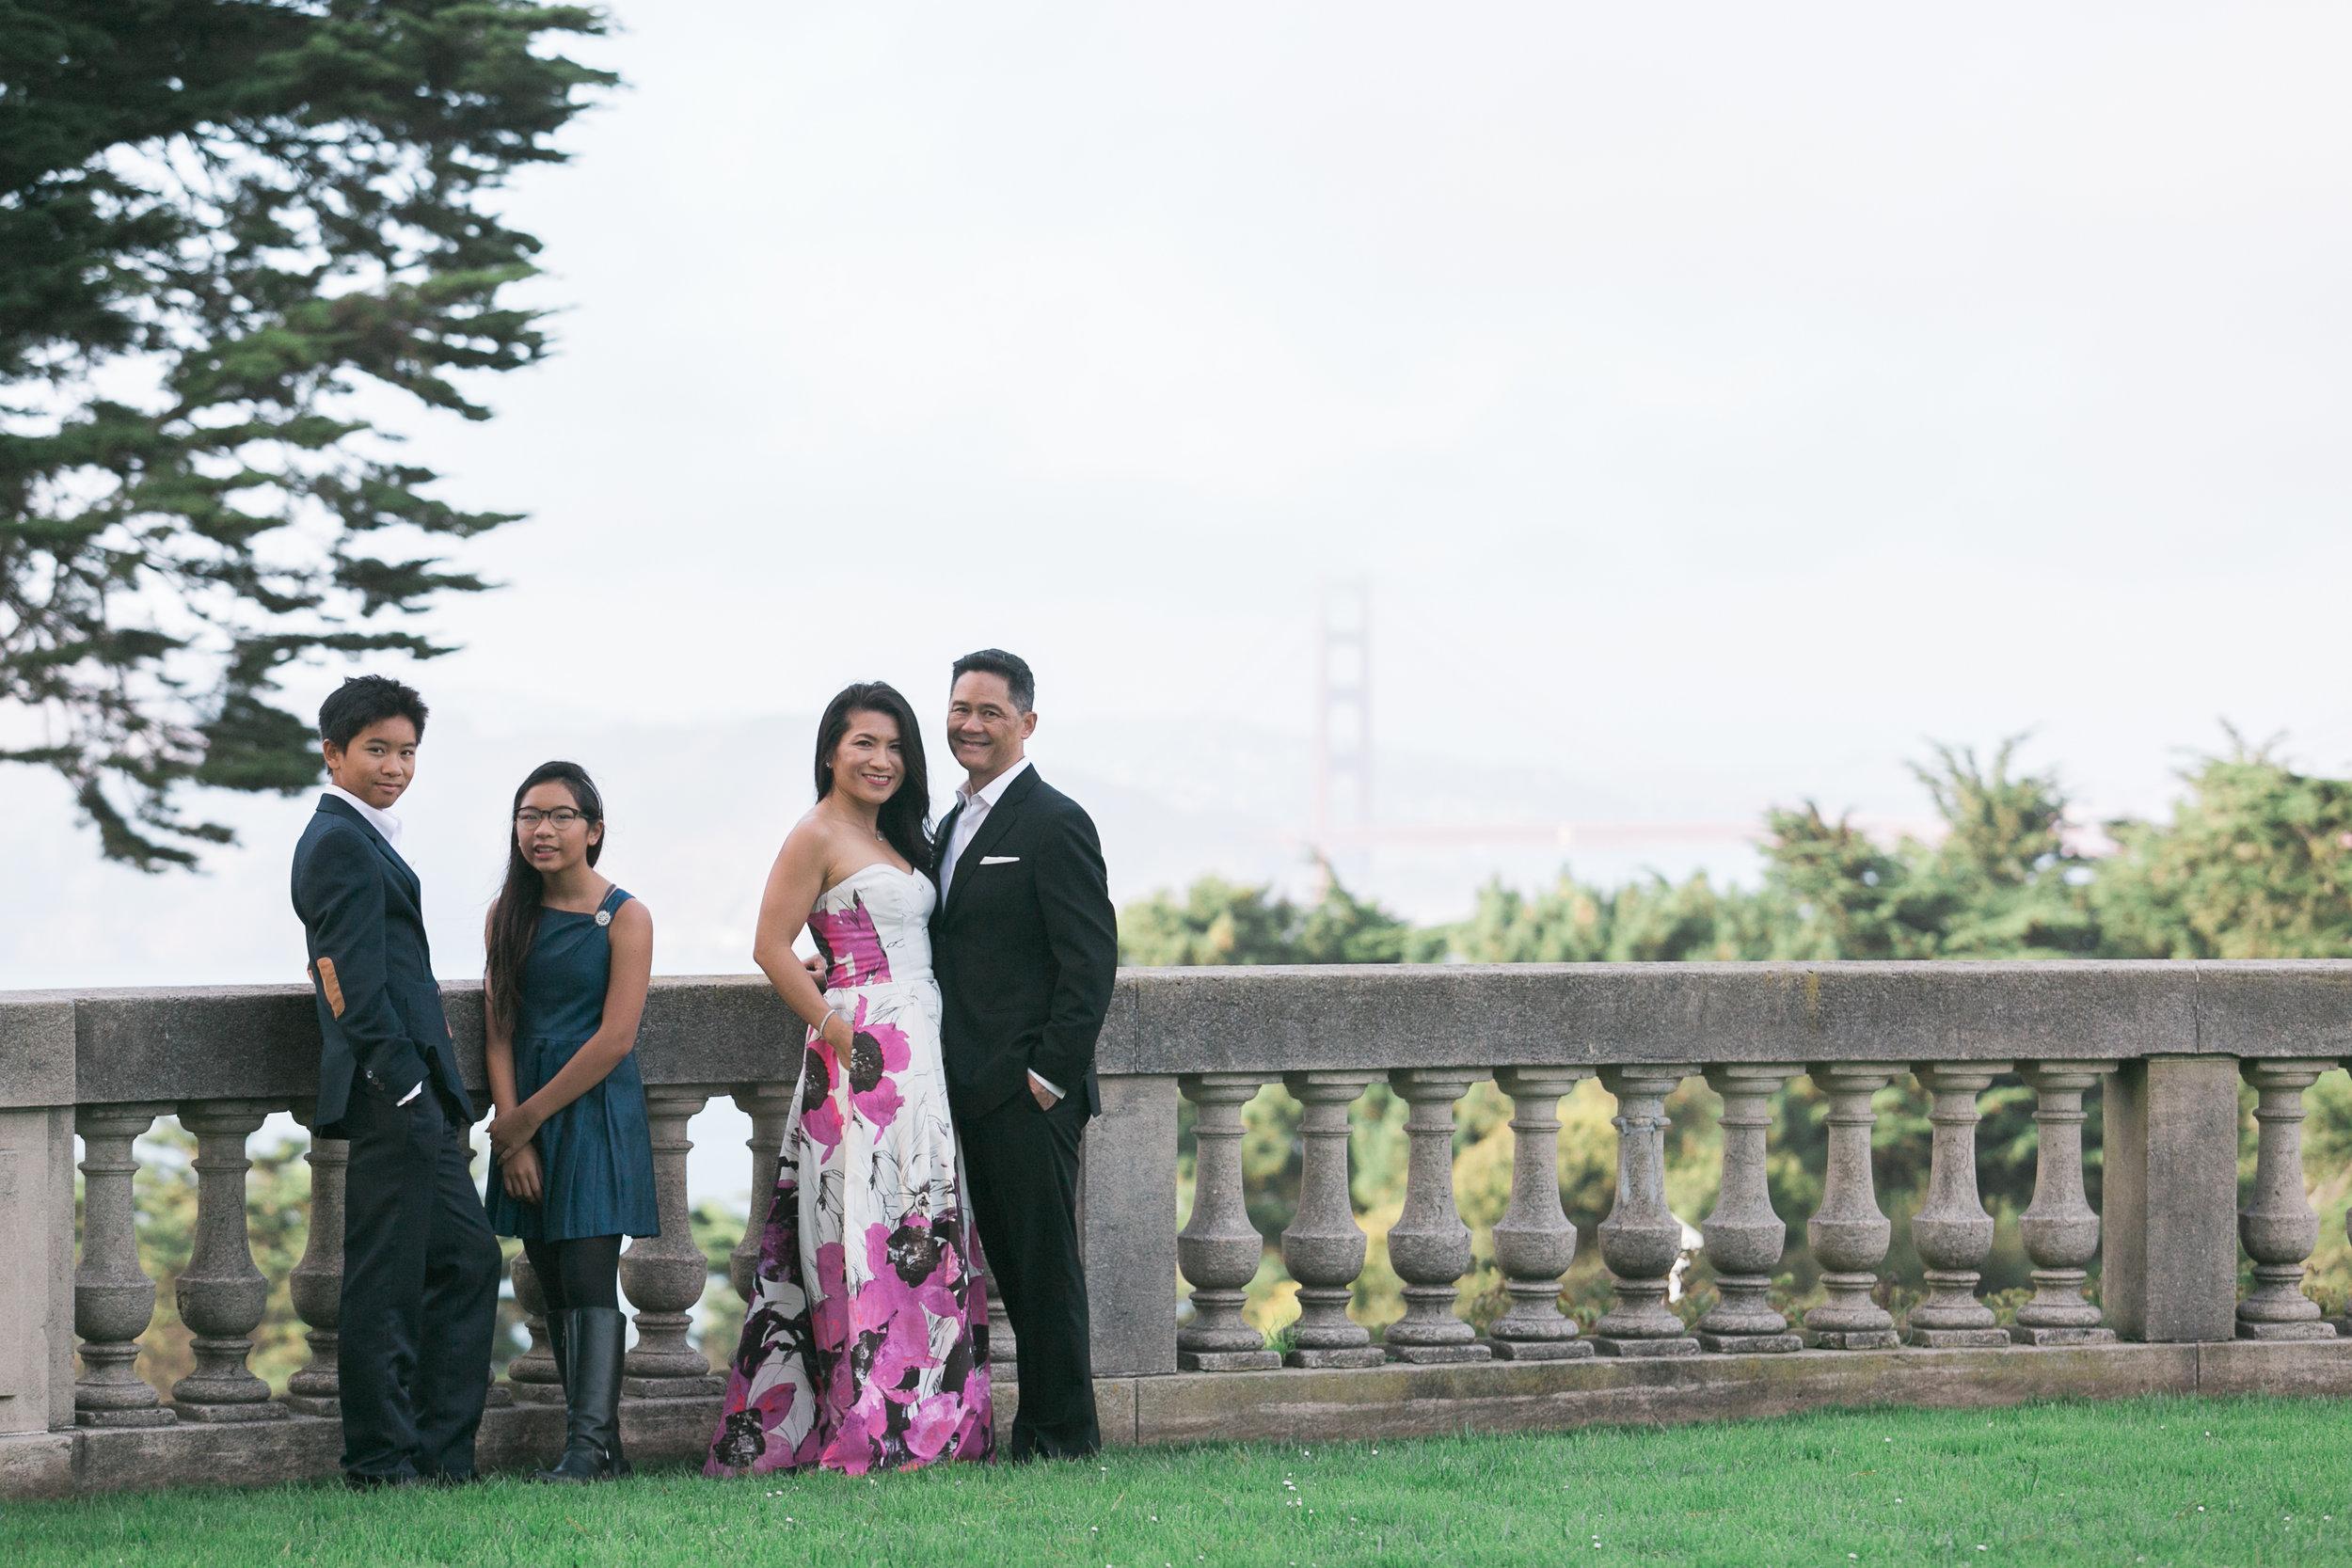 San_Francisco_Children_Family_Portraits_011.jpg